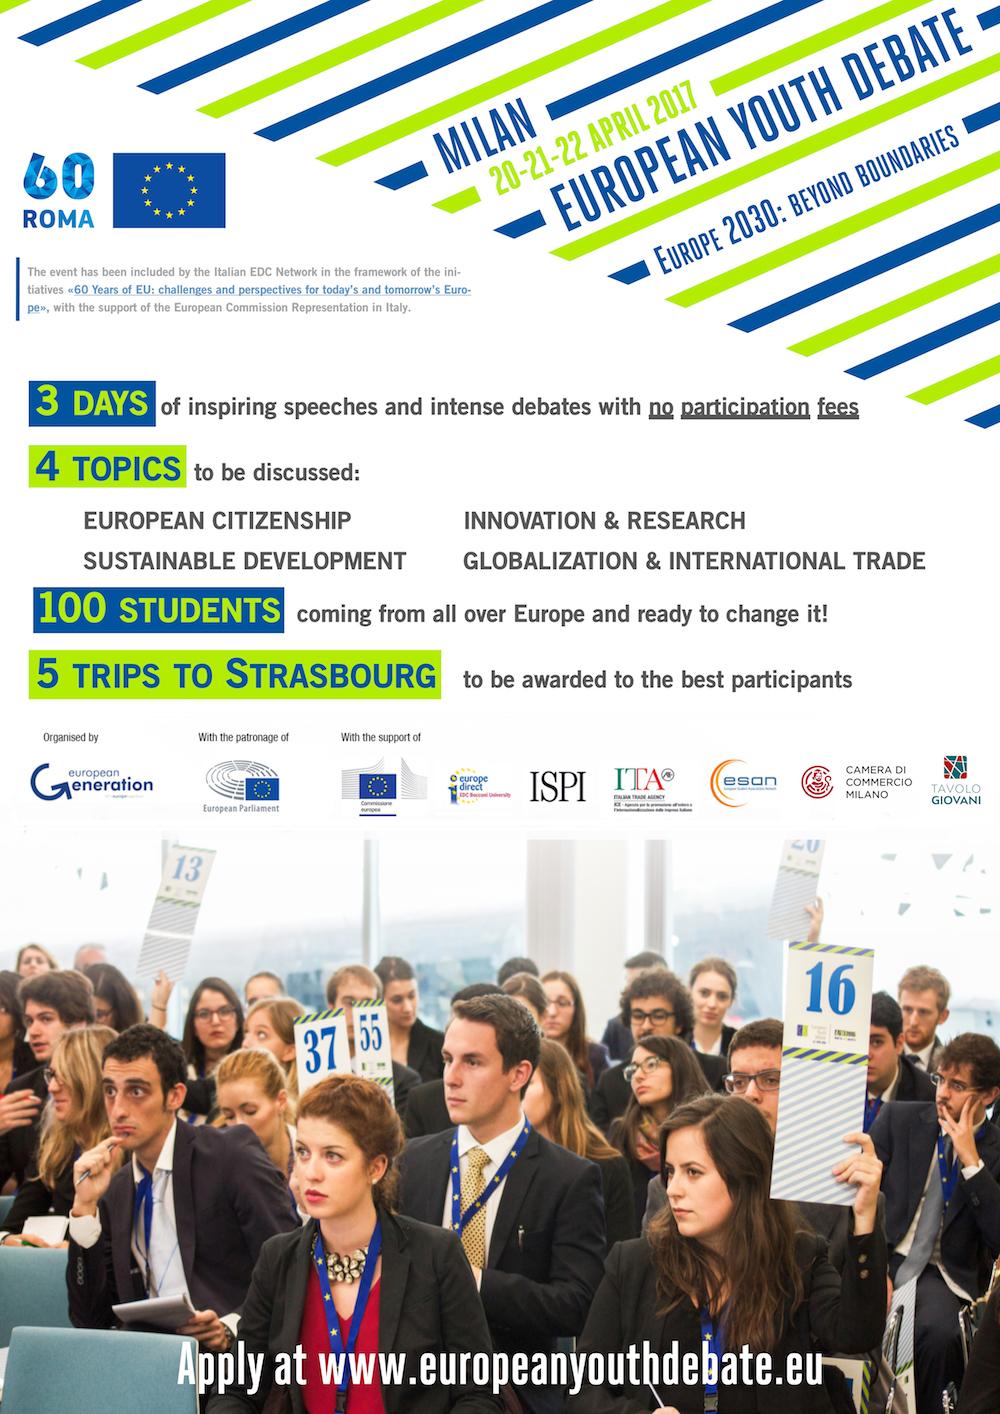 European Youth Debate 2017 - Europe 2030: beyond boundaries